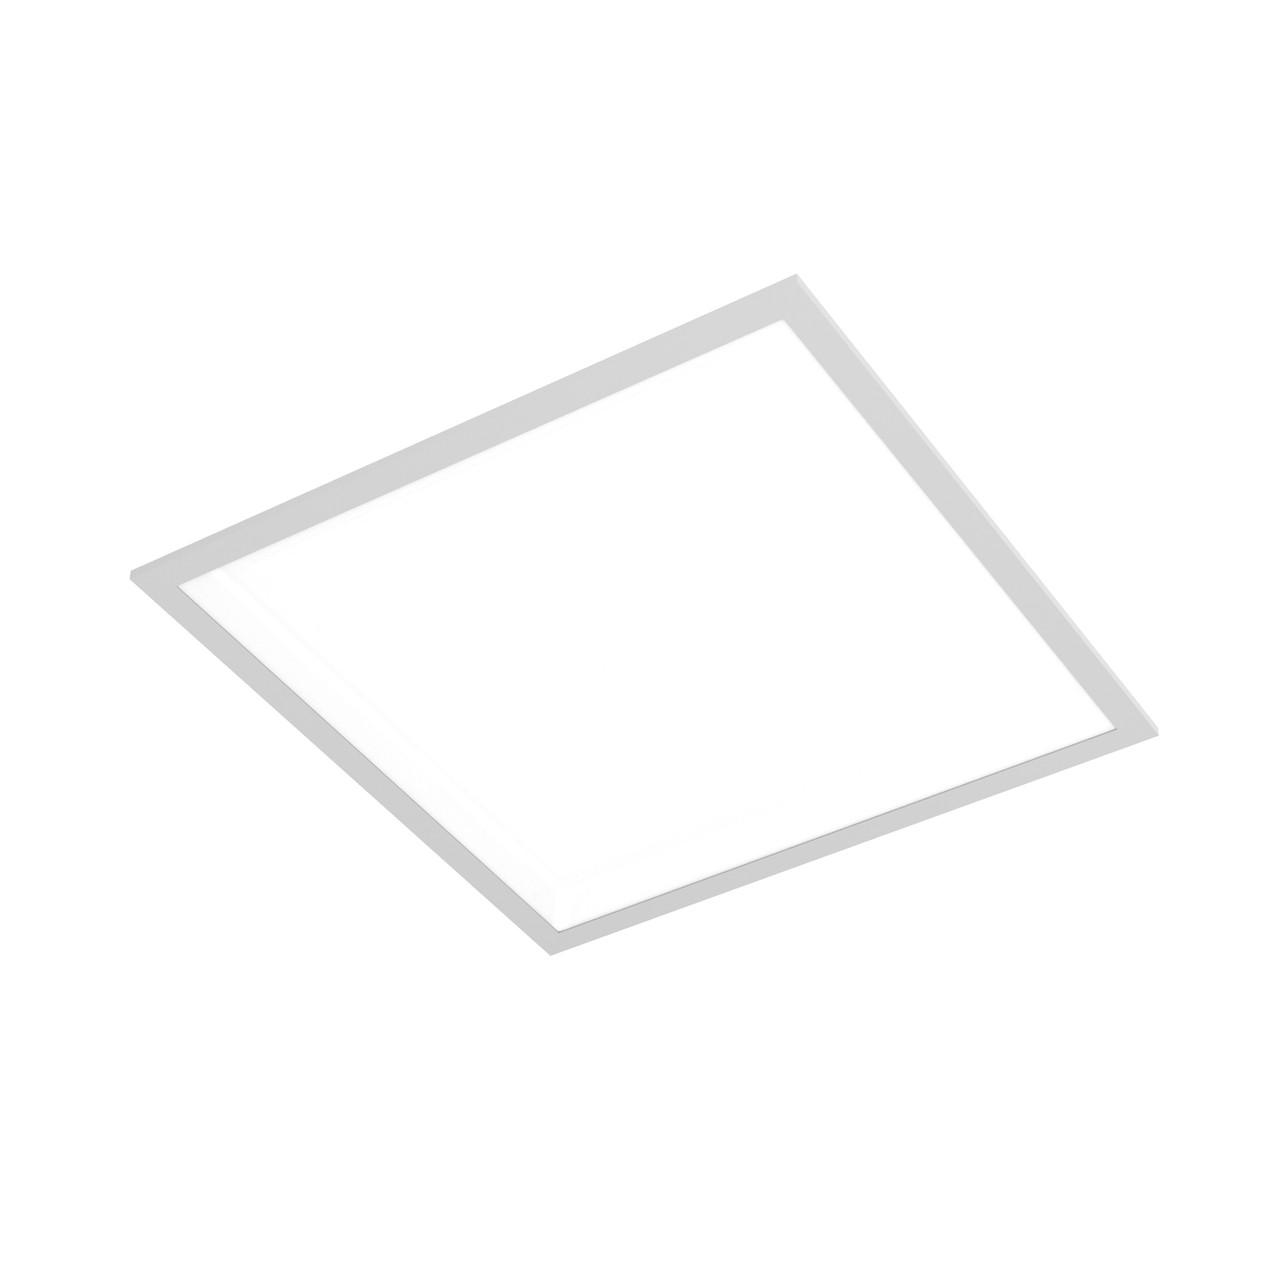 2x2 LED Flat panel, 30/40/45 adj wattage, 3500/4000/5000K CCT adj, 120-277V, 0-10VDC dimming (AL-S-2X2)